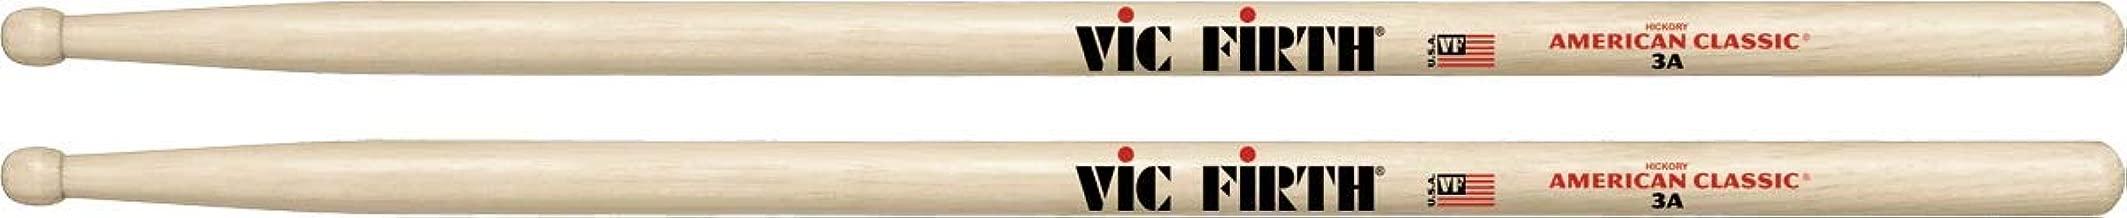 Vic Firth American Classic 3A